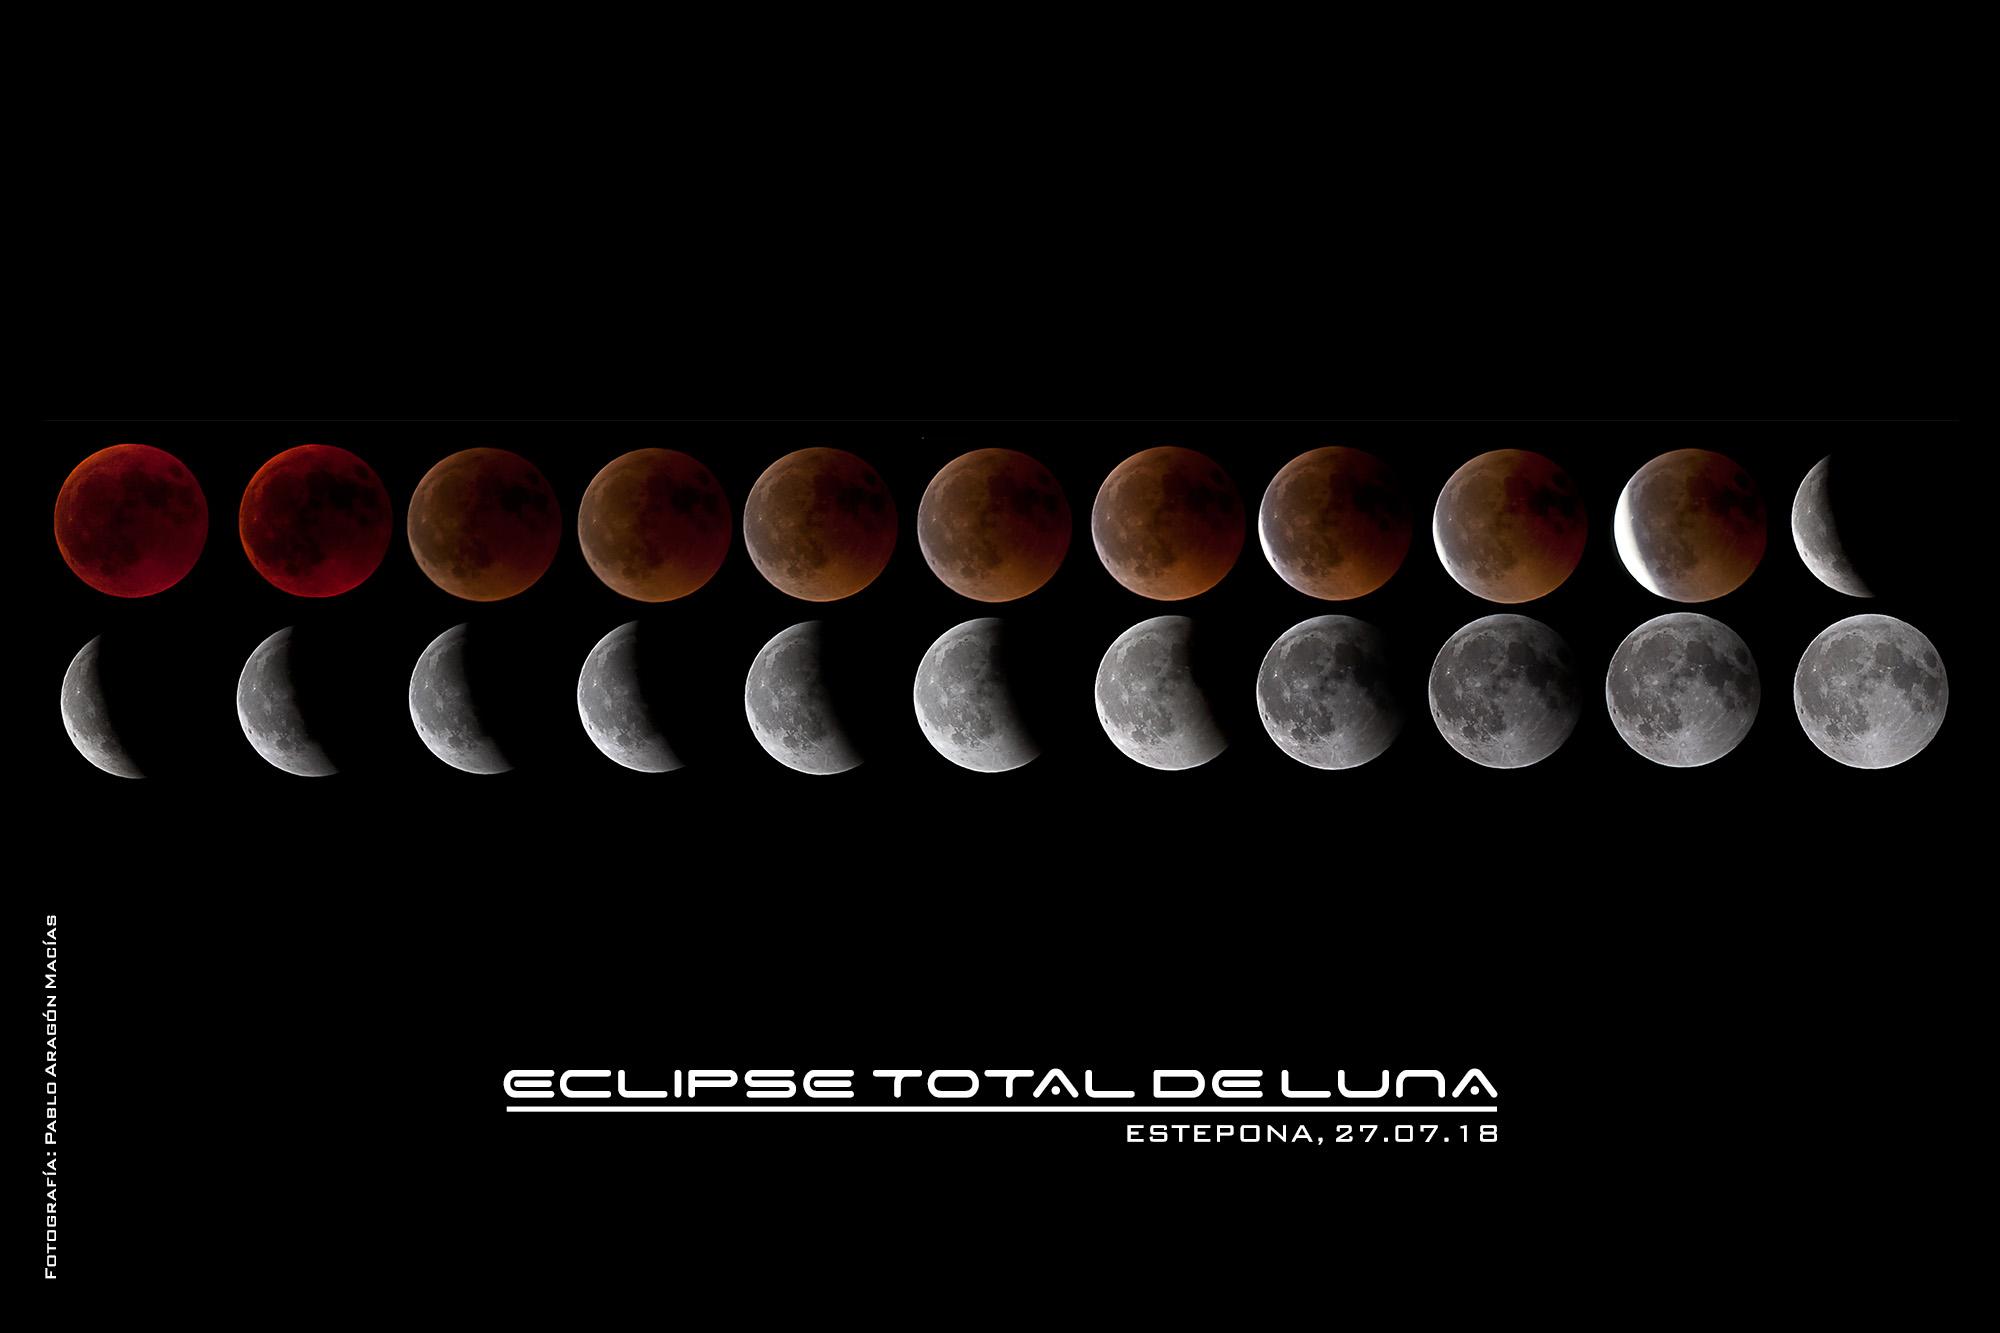 Eclipse total de Luna 27.07.18